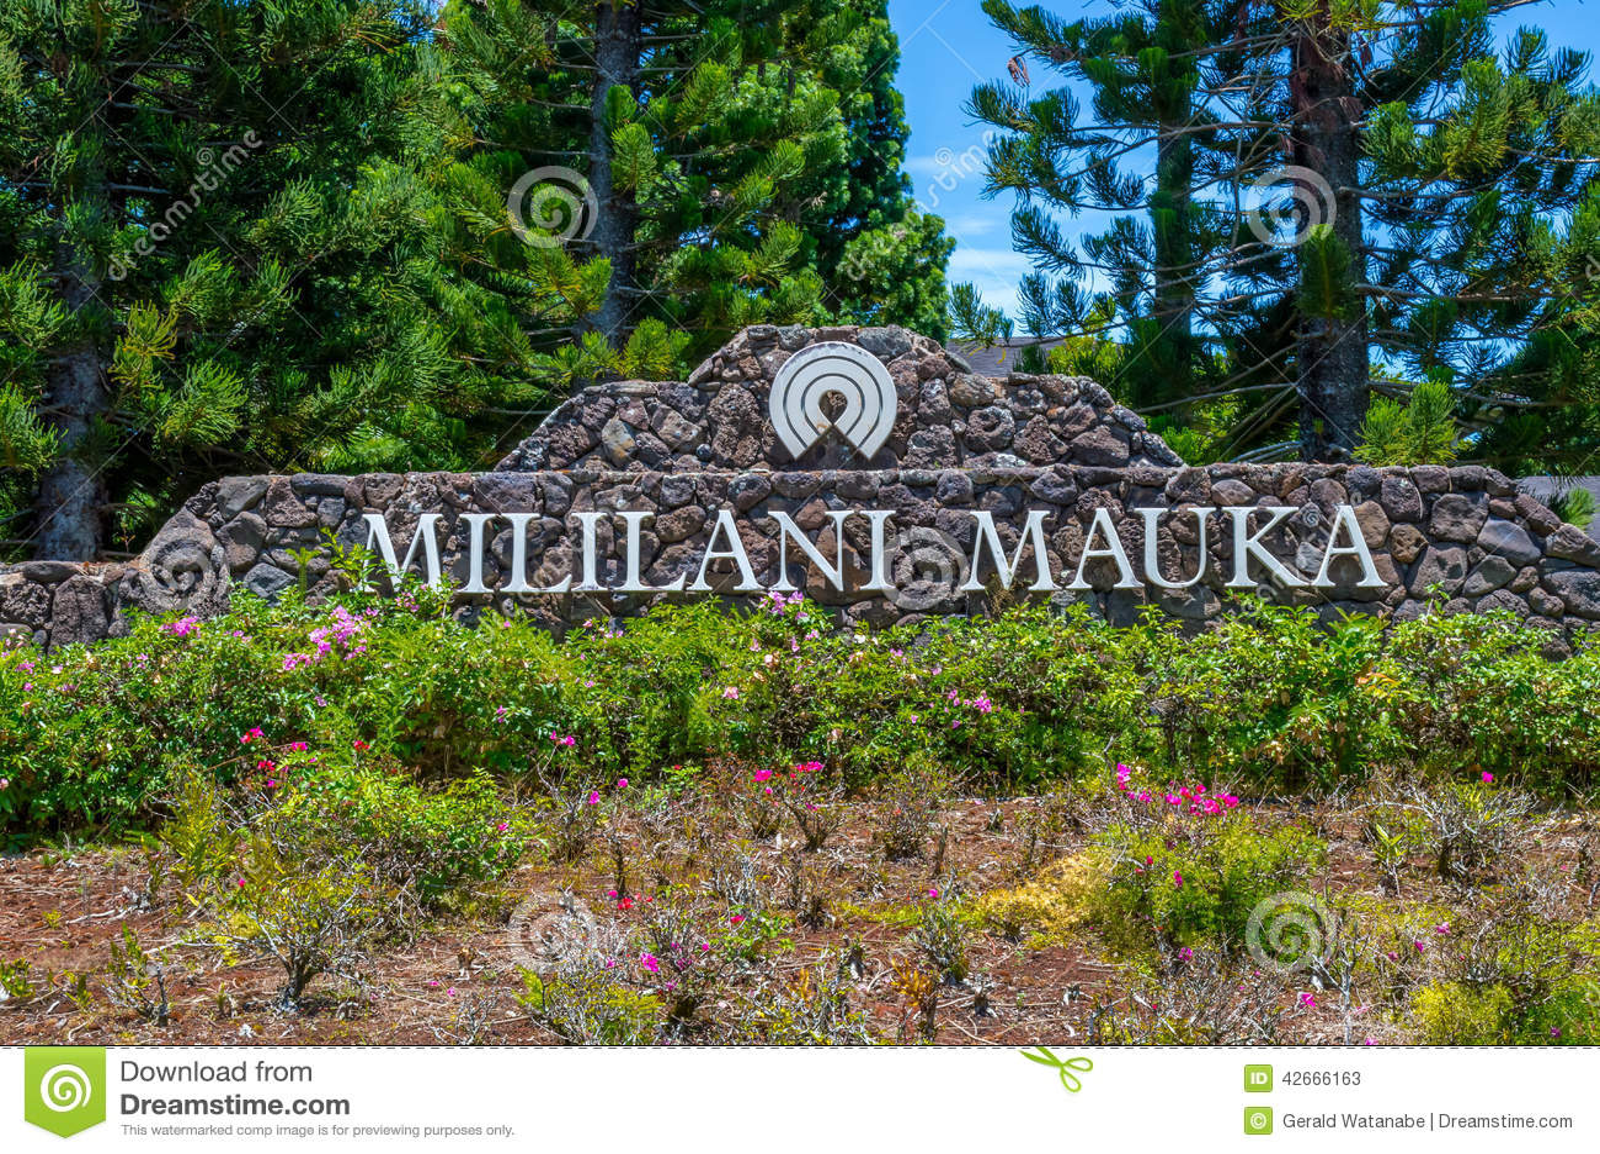 Singles in mililani mauka hi Aliana St, Mililani, Hi - $k home Sold Mililani Mauka